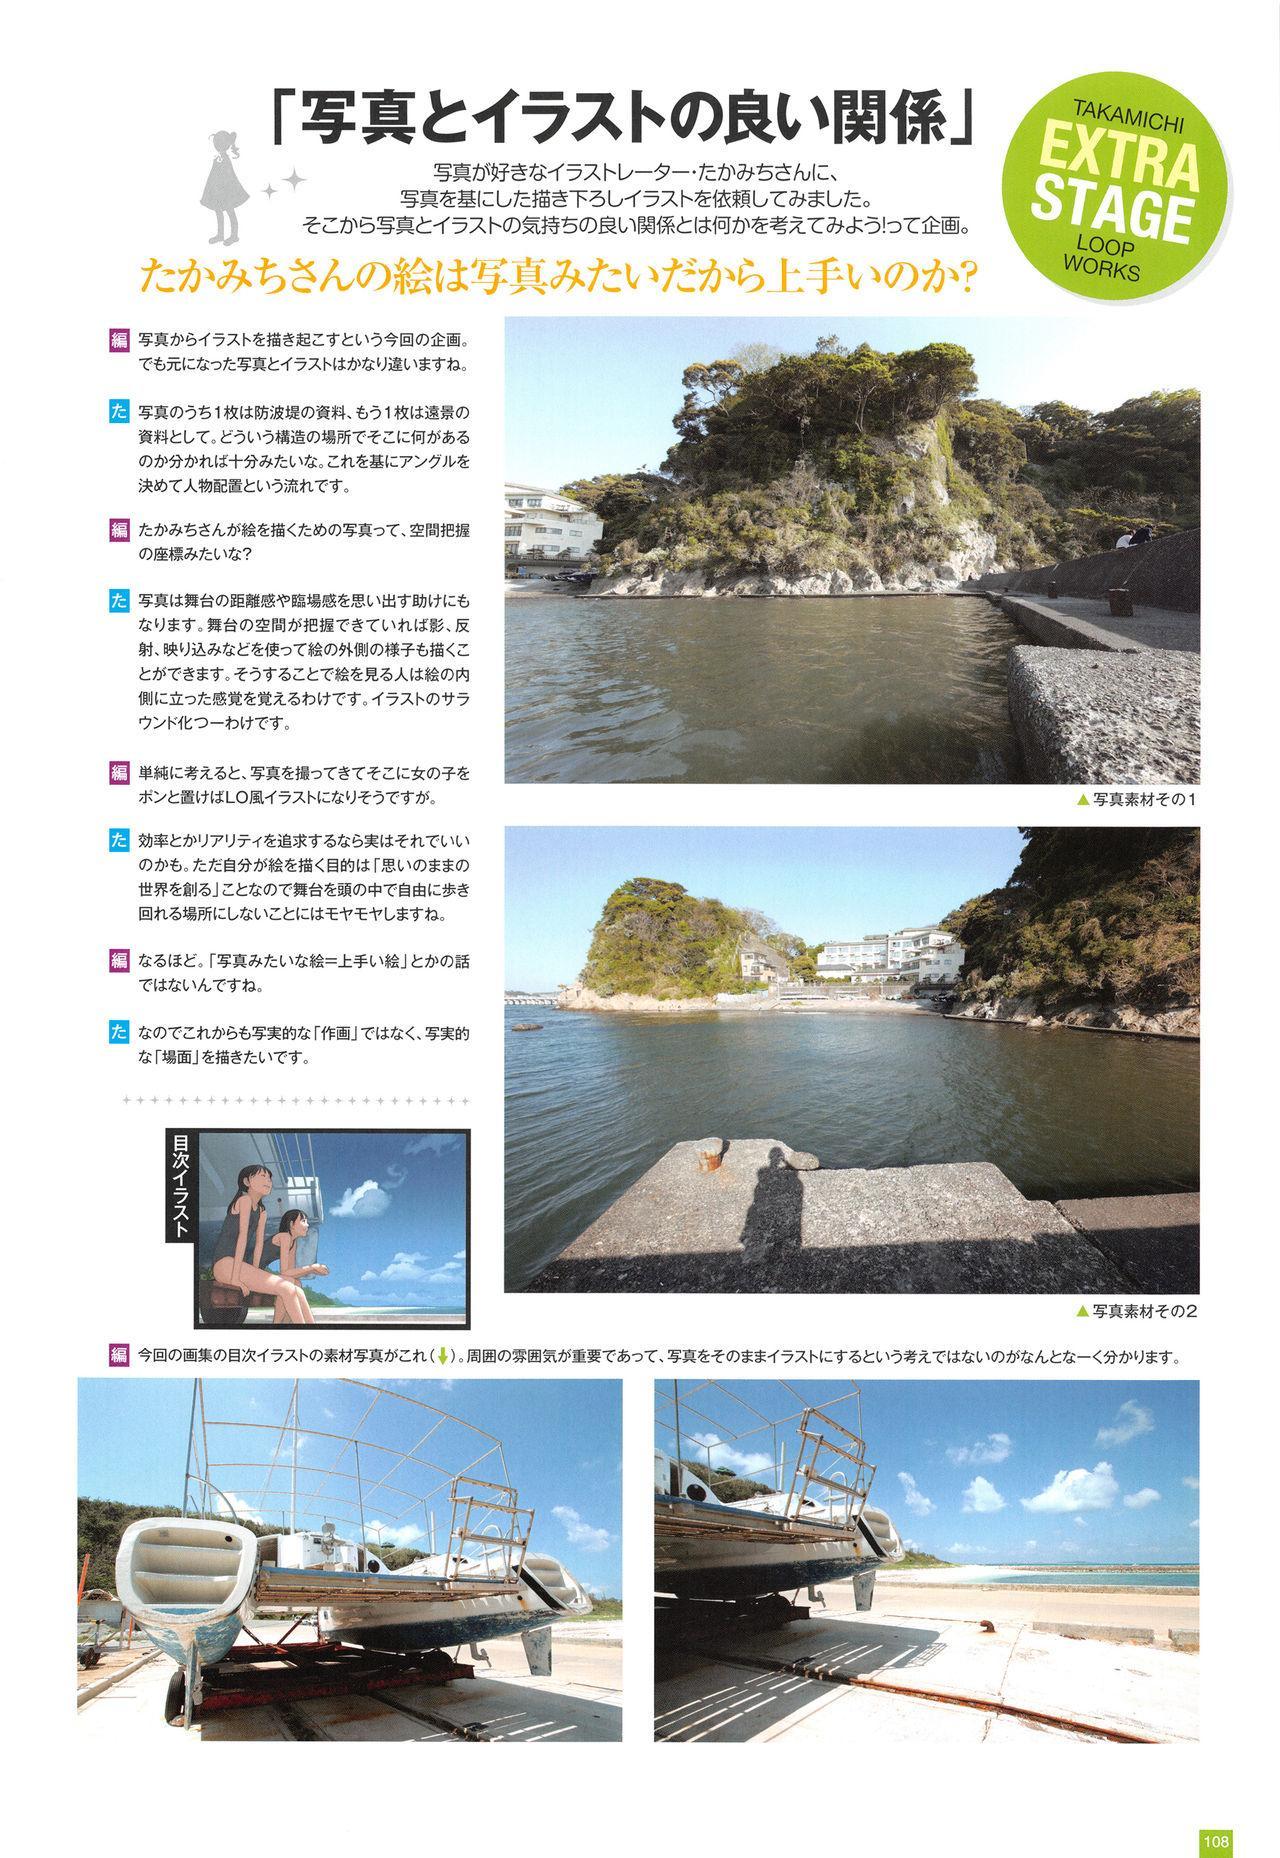 LO Artbook 2-A TAKAMICHI LOOP WORKS 110